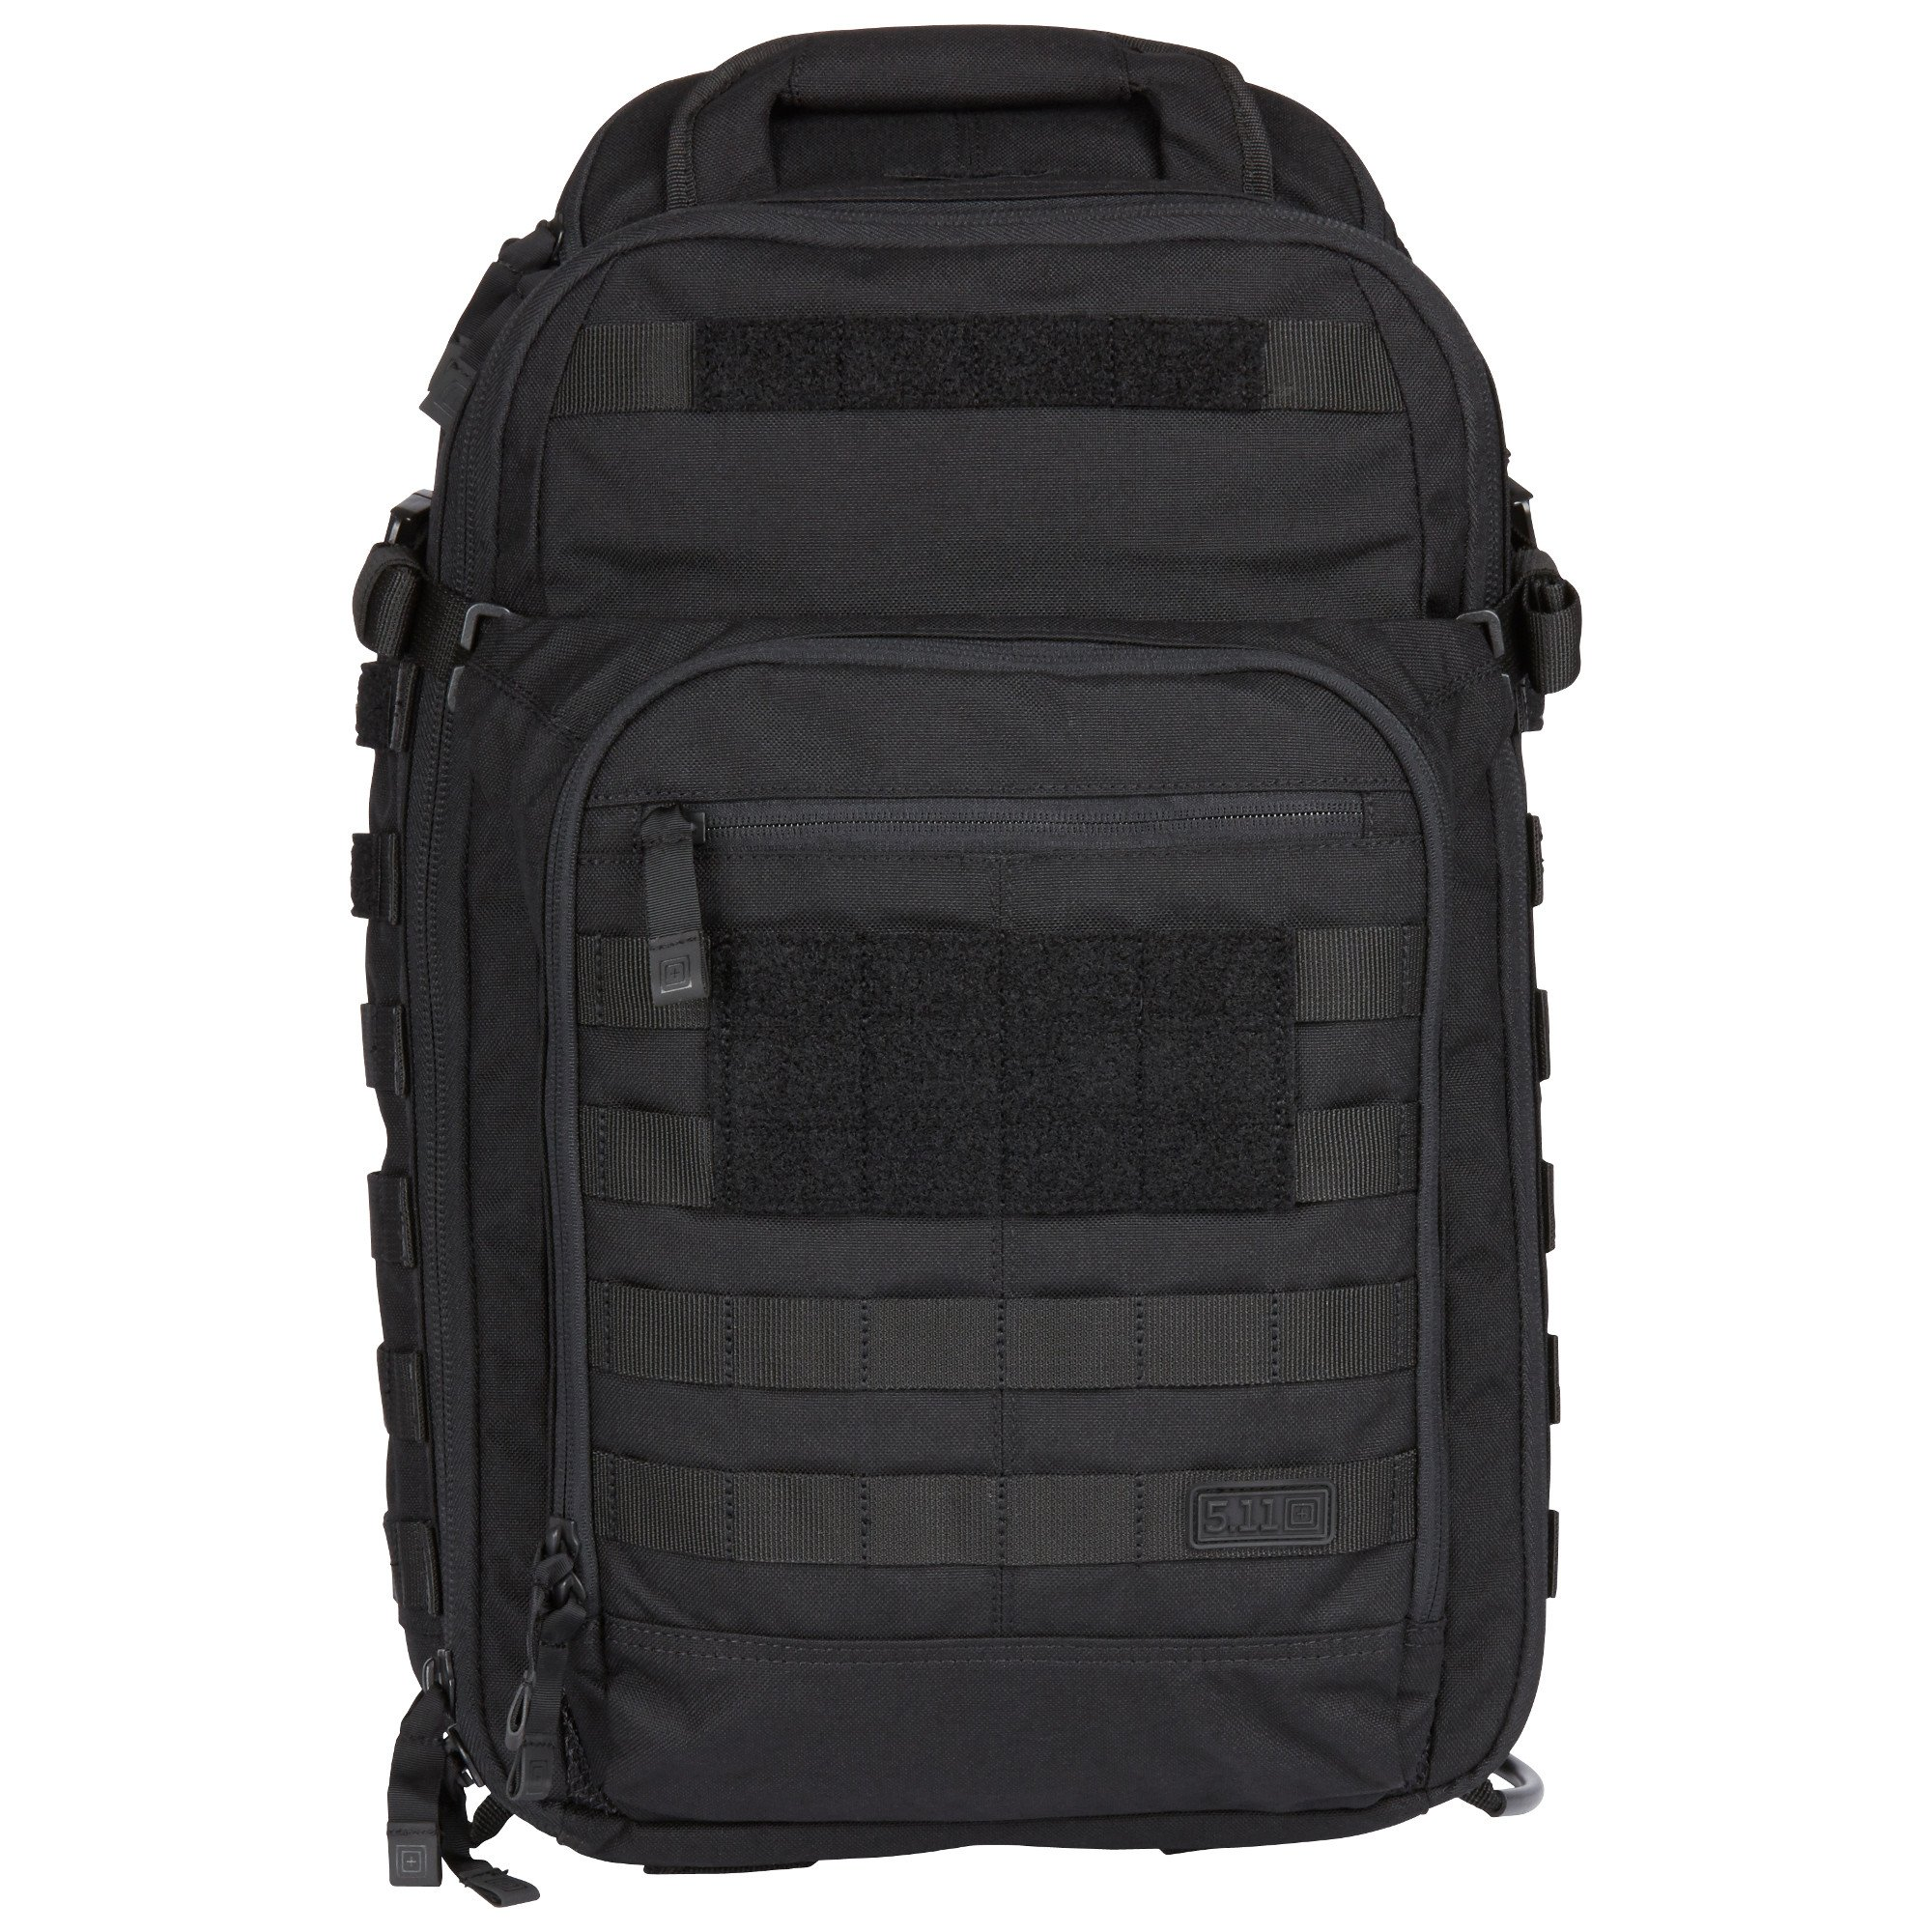 Balo 5.11 Tactical ALL HAZARDS NITRO 21L – Black